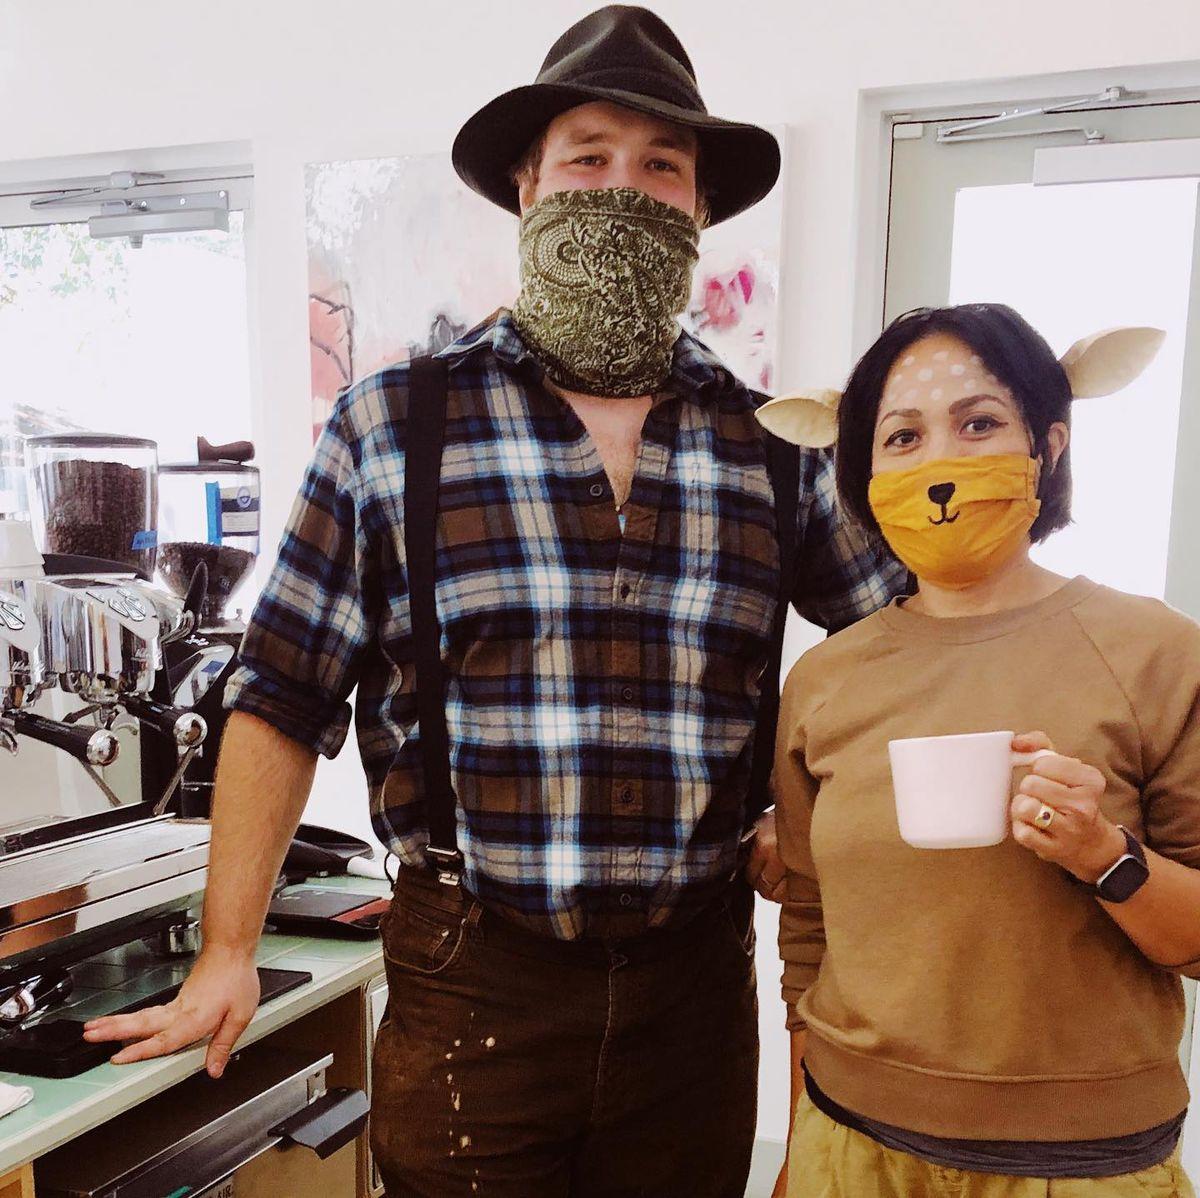 Thai Fresh/Gati's Jam Santicat as a deer and a staffer in Western gear